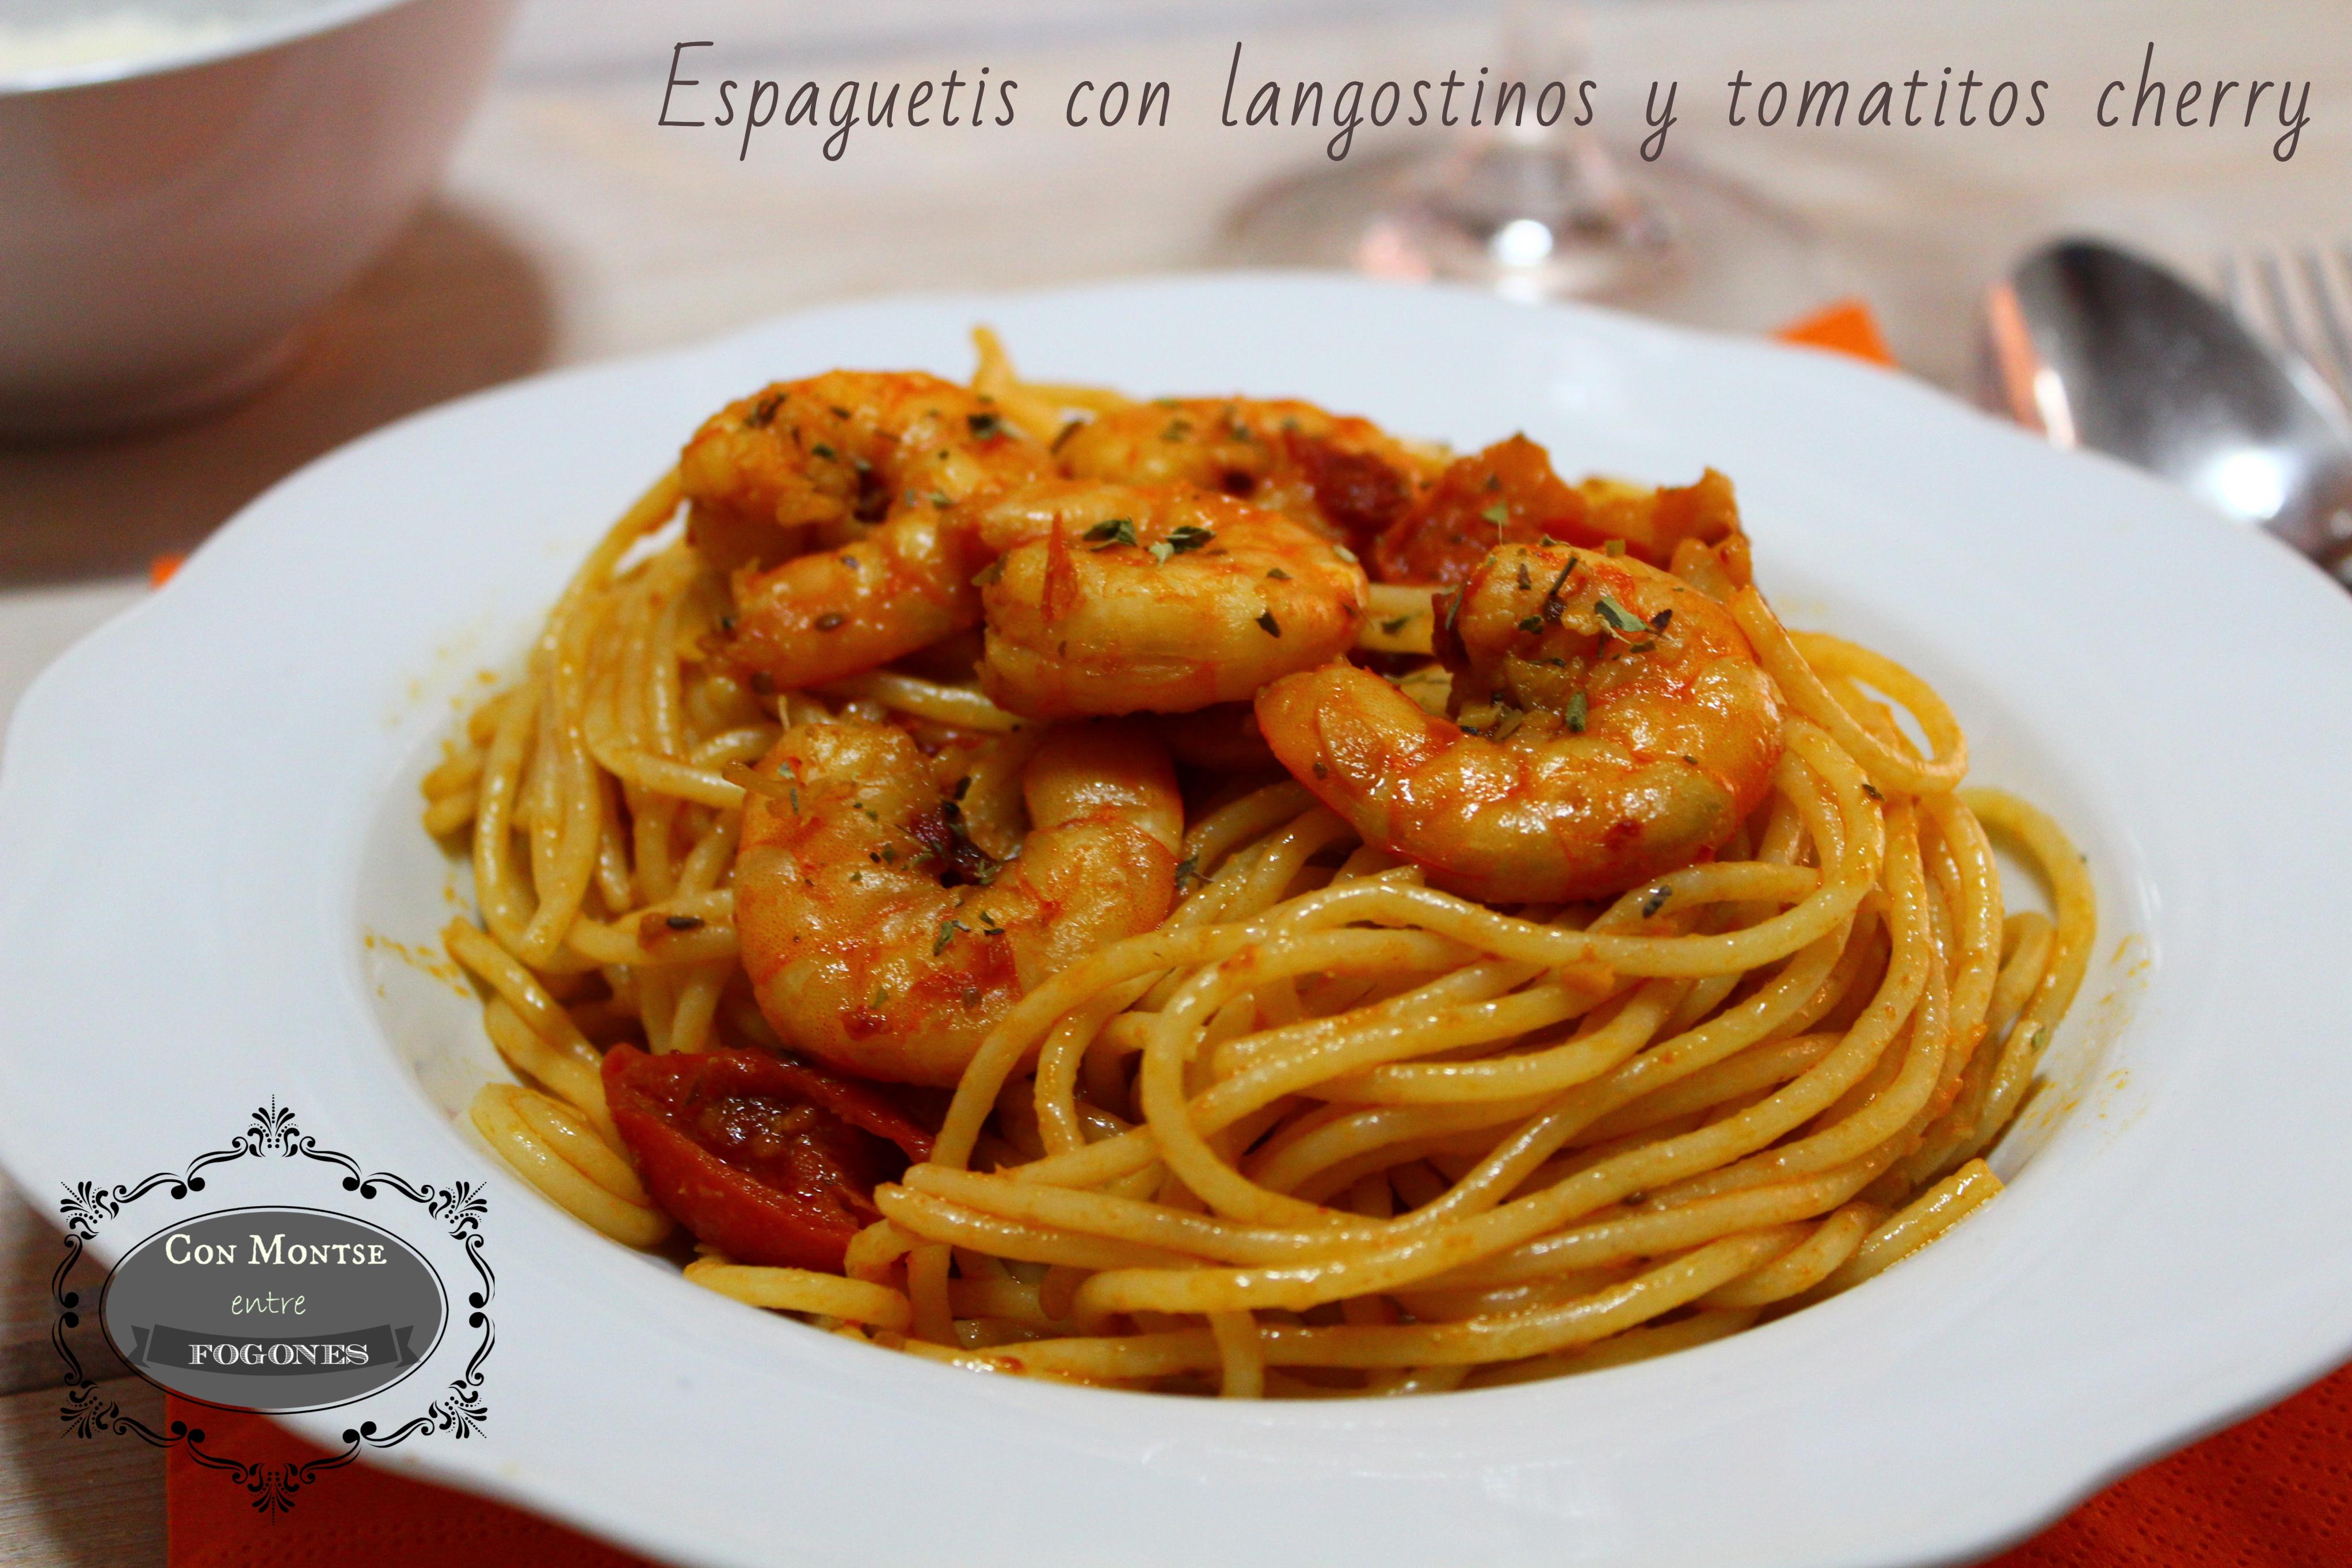 Espaguetis con langostinos y tomateros cherry